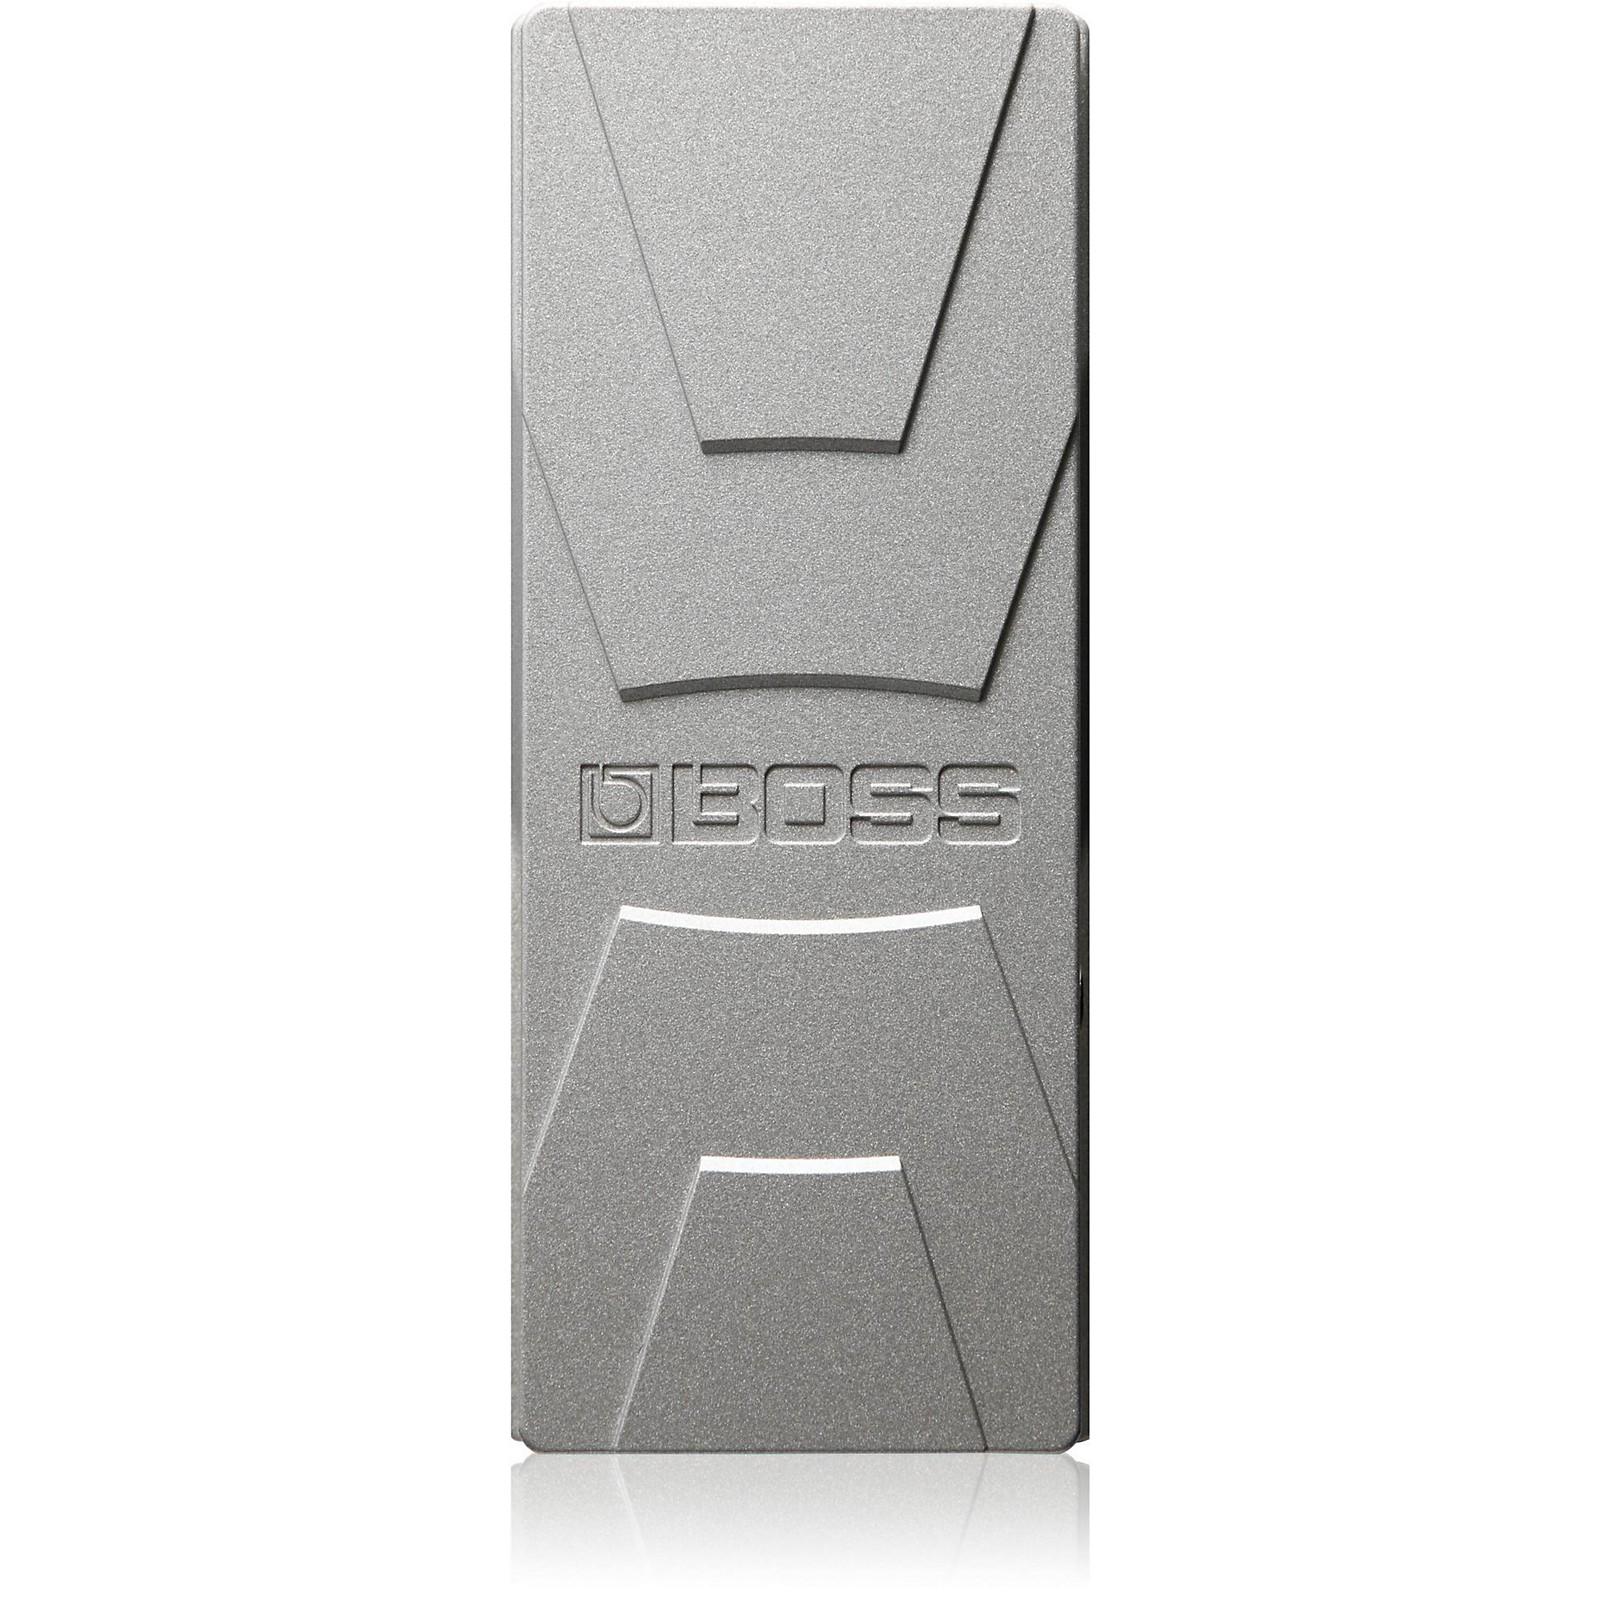 Boss FV-30H Compact Volume Pedal